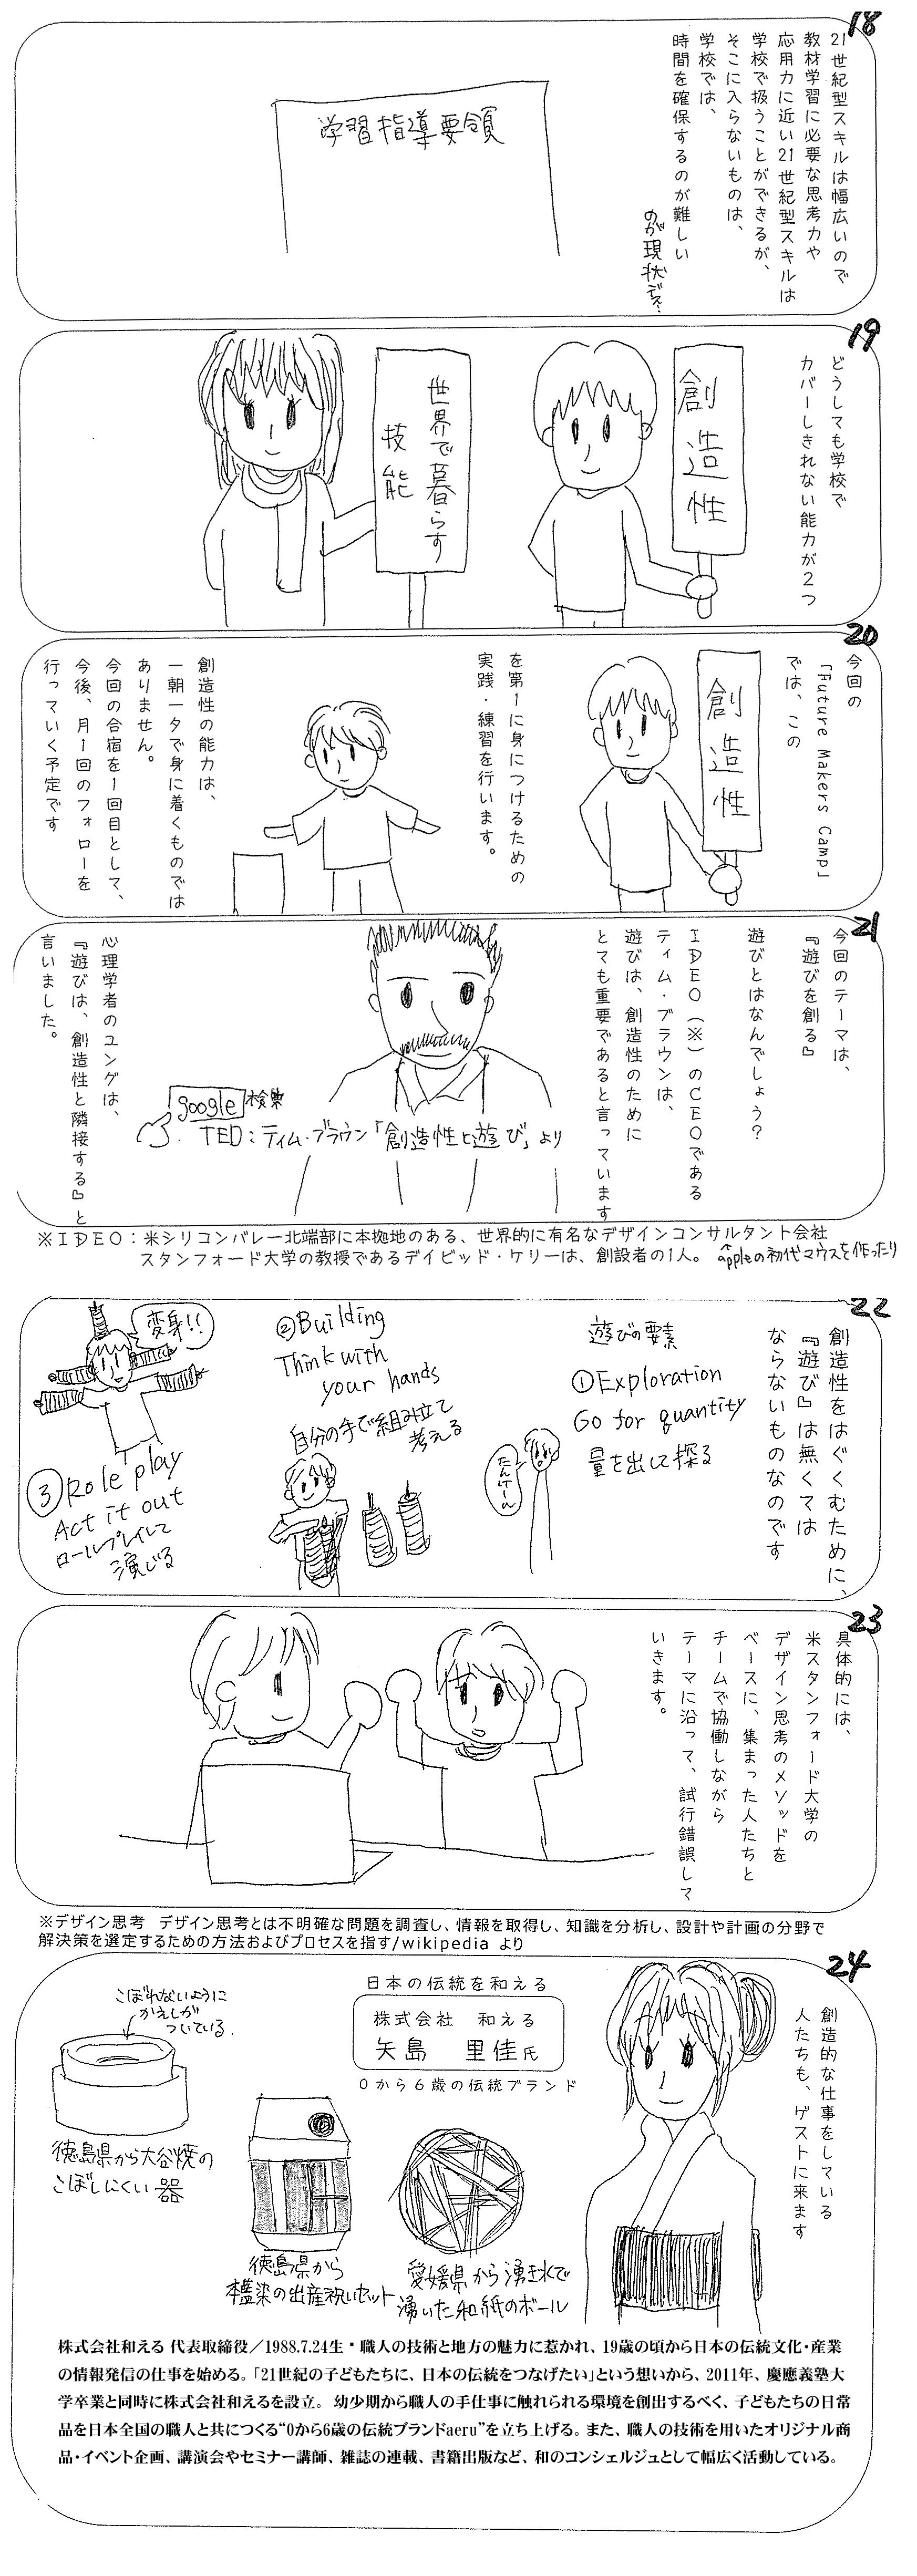 http://www.cobon.jp/news/%E6%BC%AB%E7%94%BB%E5%A4%89%E6%8F%9B3.jpg